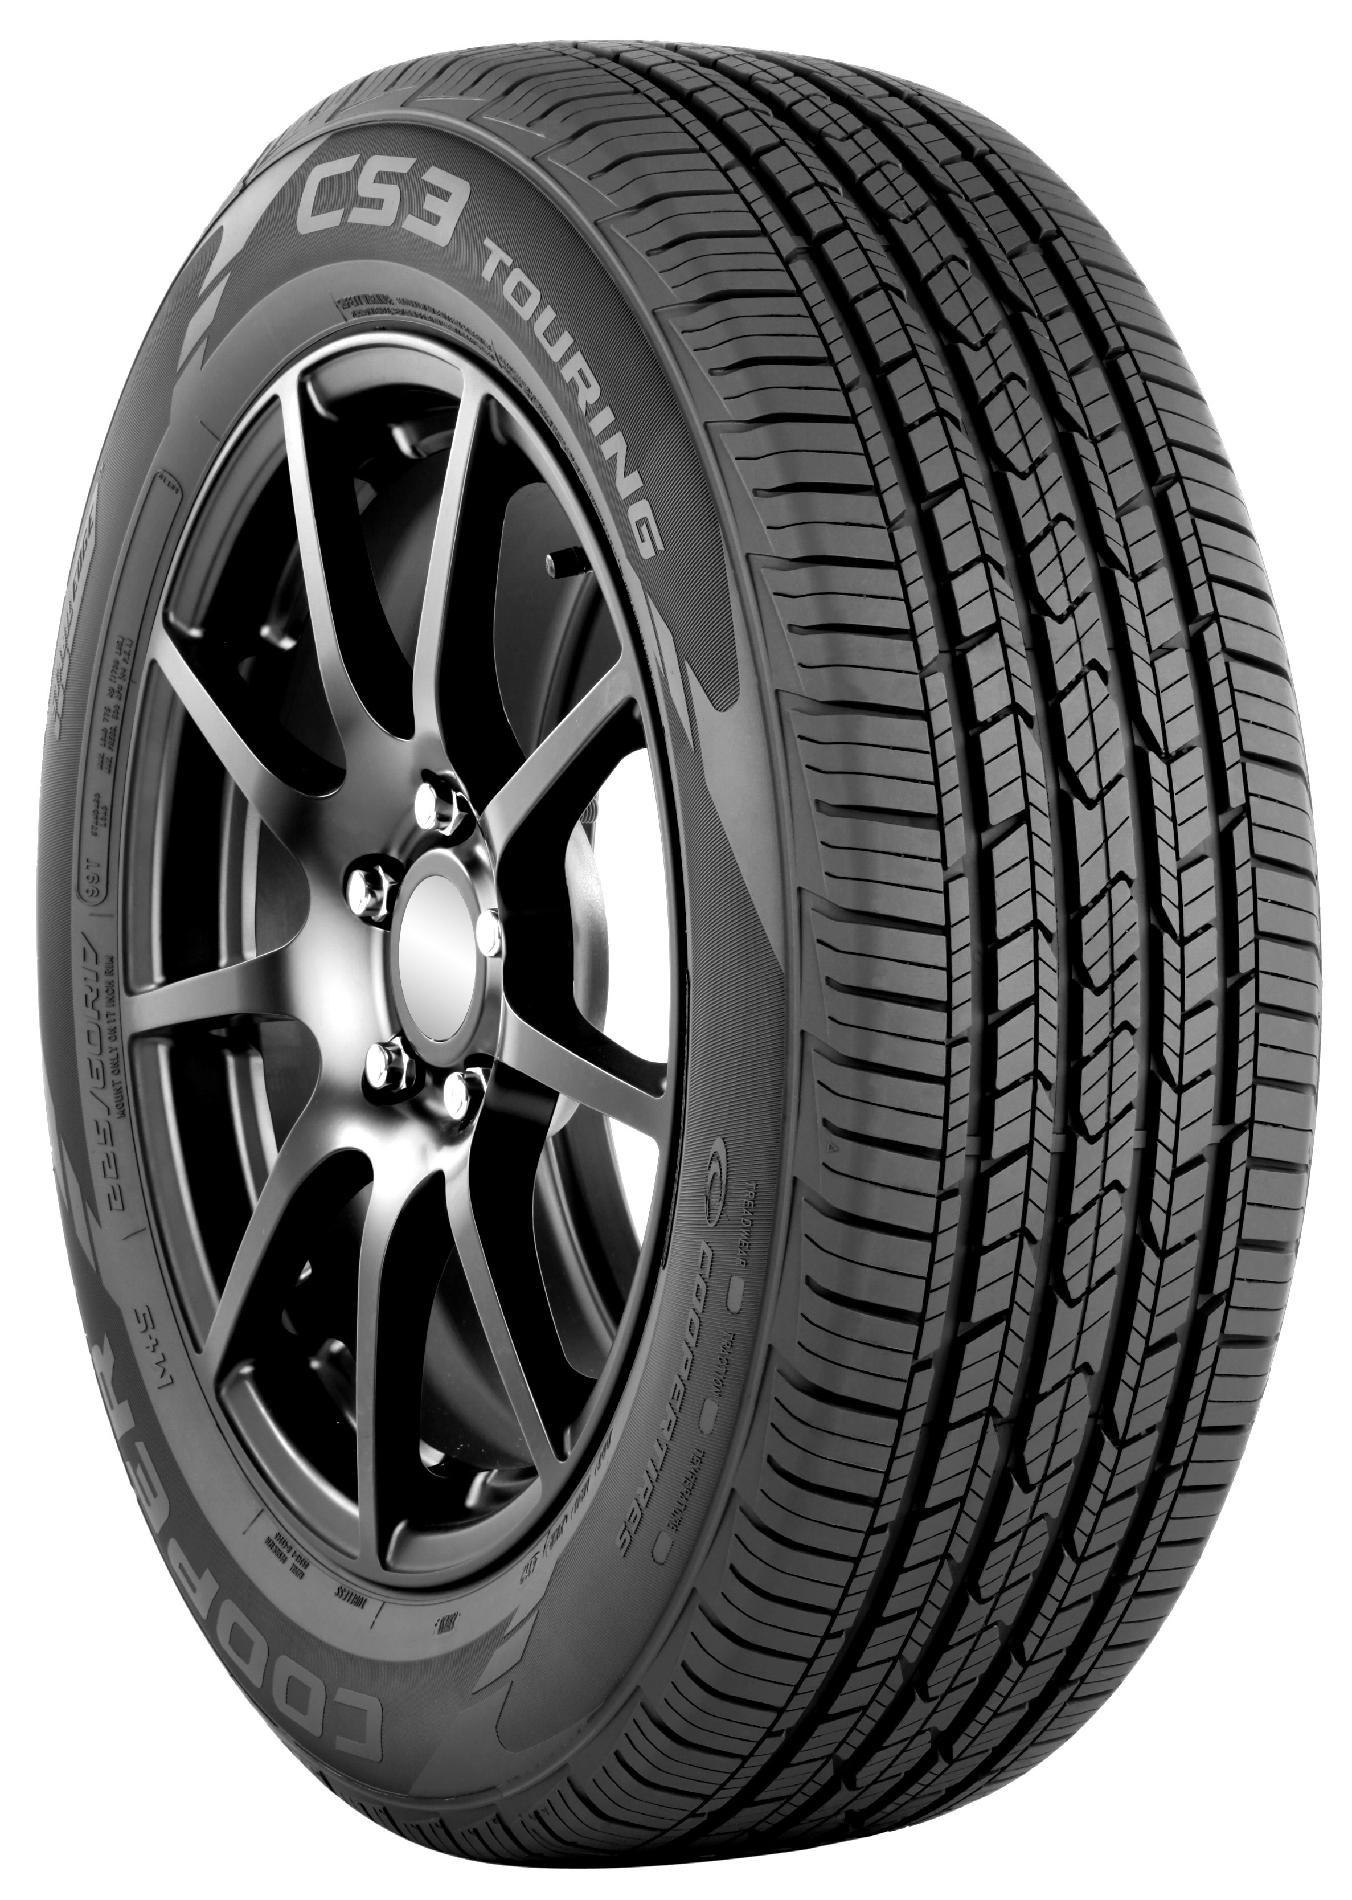 Cooper CS3 TOURING - 215/55R16 97H - All Season Tire